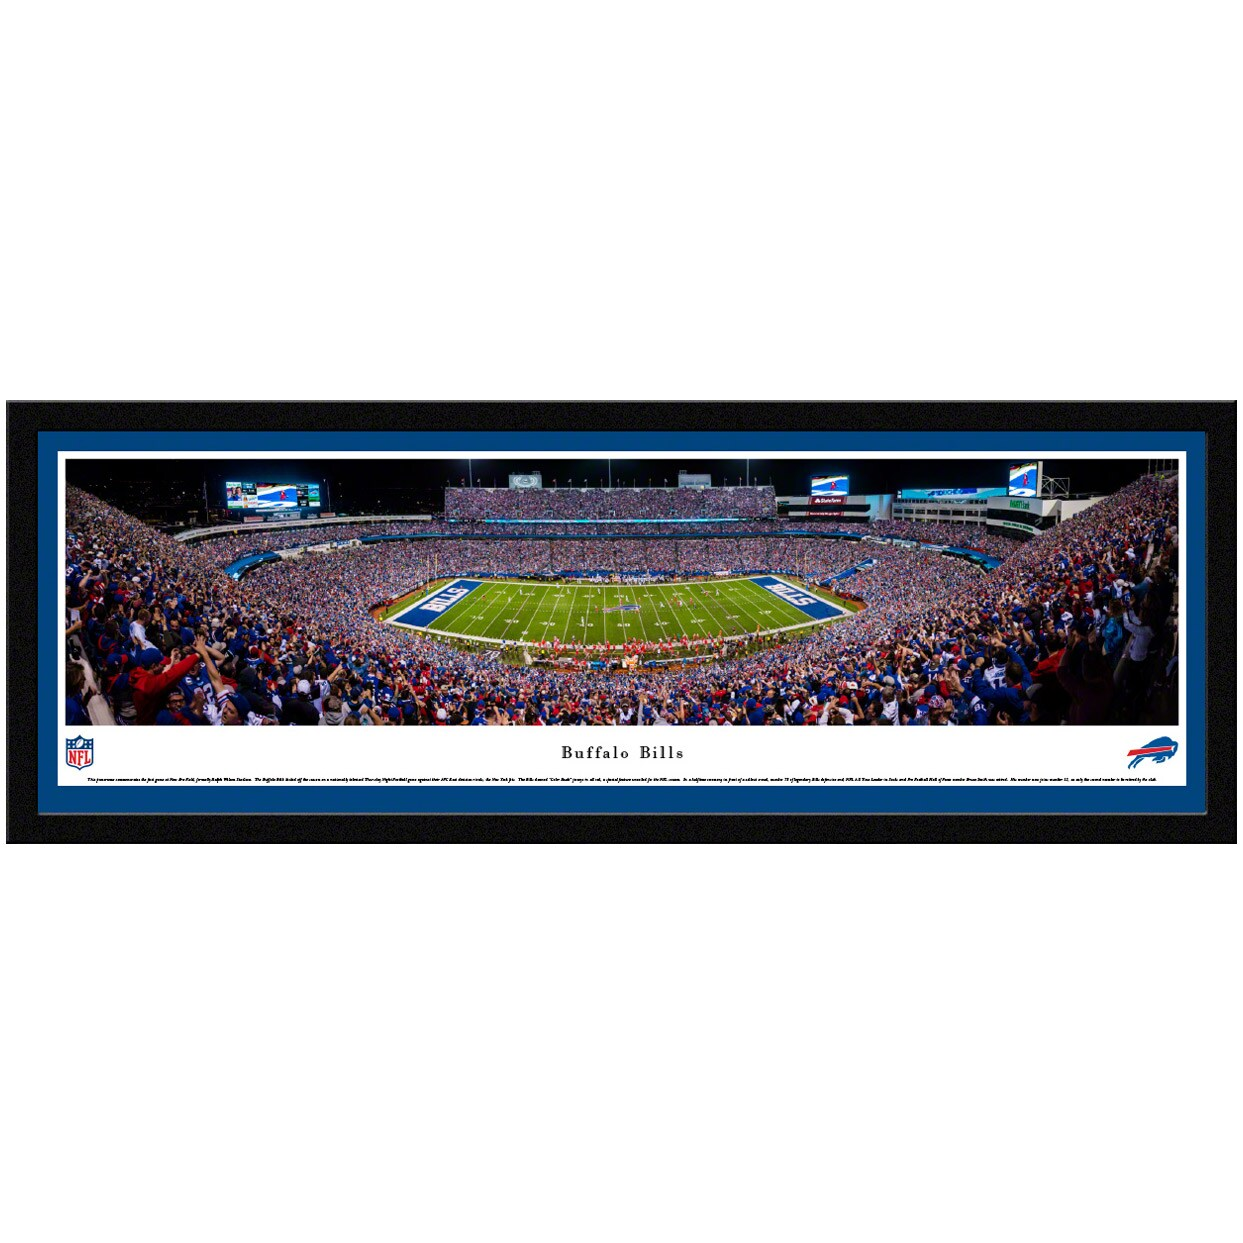 "Buffalo Bills 42"" x 15.5"" Select Frame Panoramic Photo"